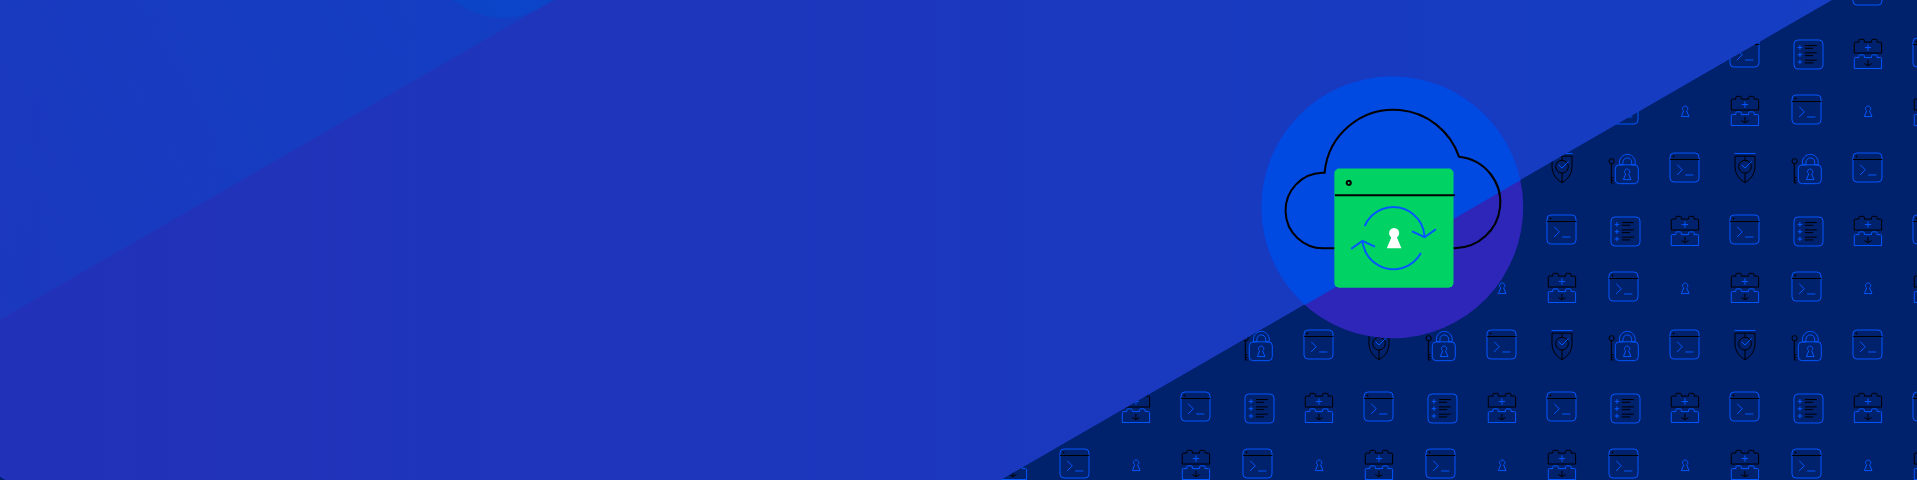 pasoe-banner